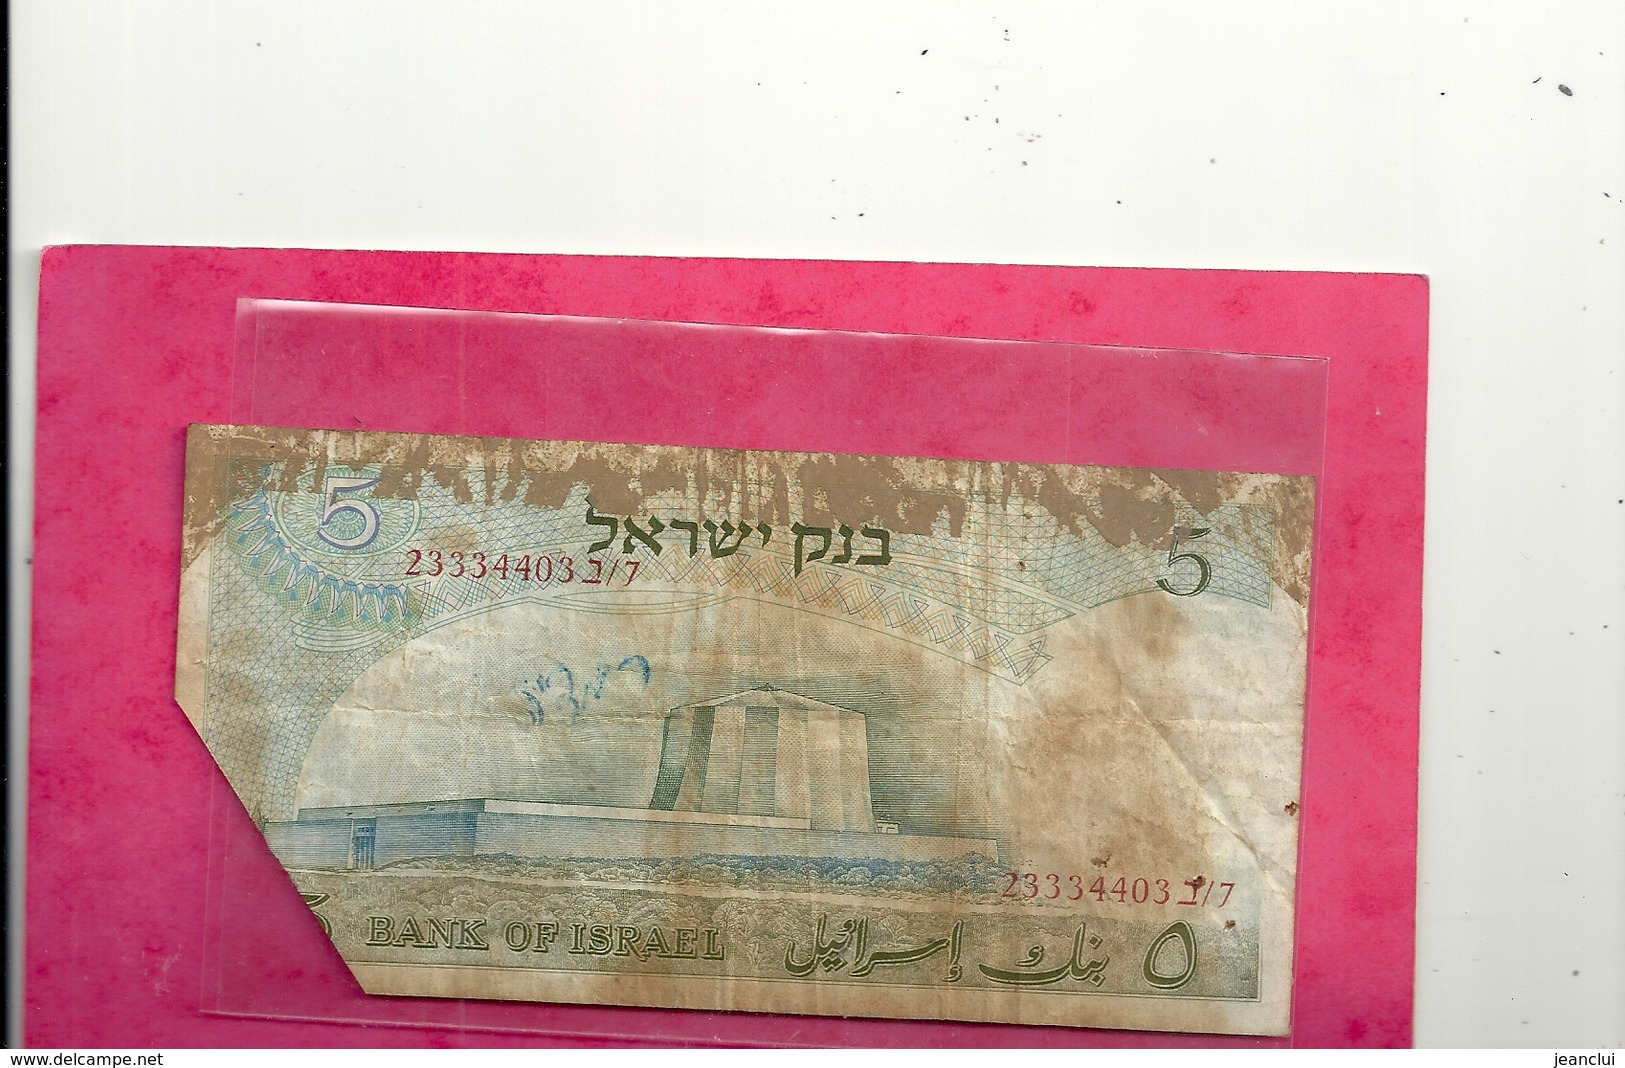 ISRAEL . 5 LIROT . GROS MANQUE DANS UN COIN  . 2 SCANES - Israel